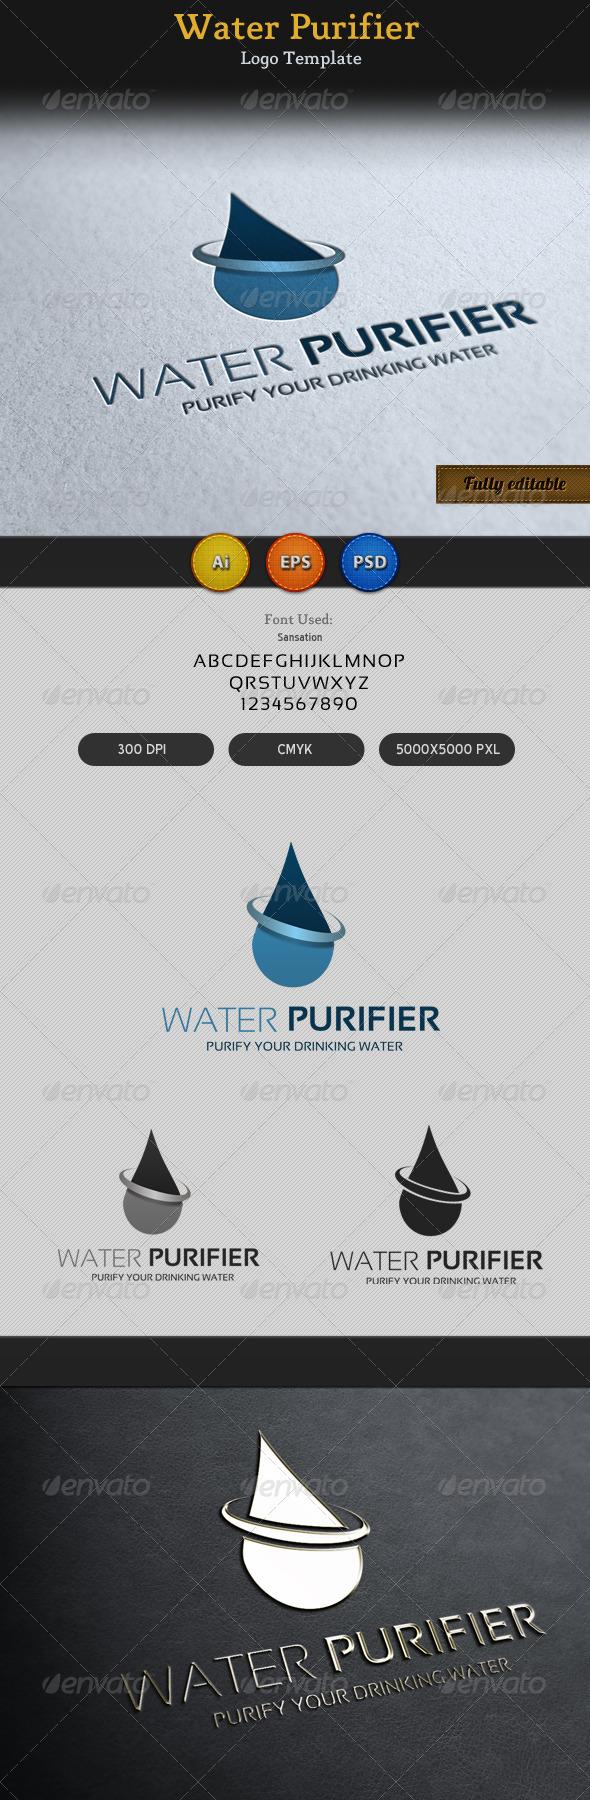 Water Purifier Logo Template